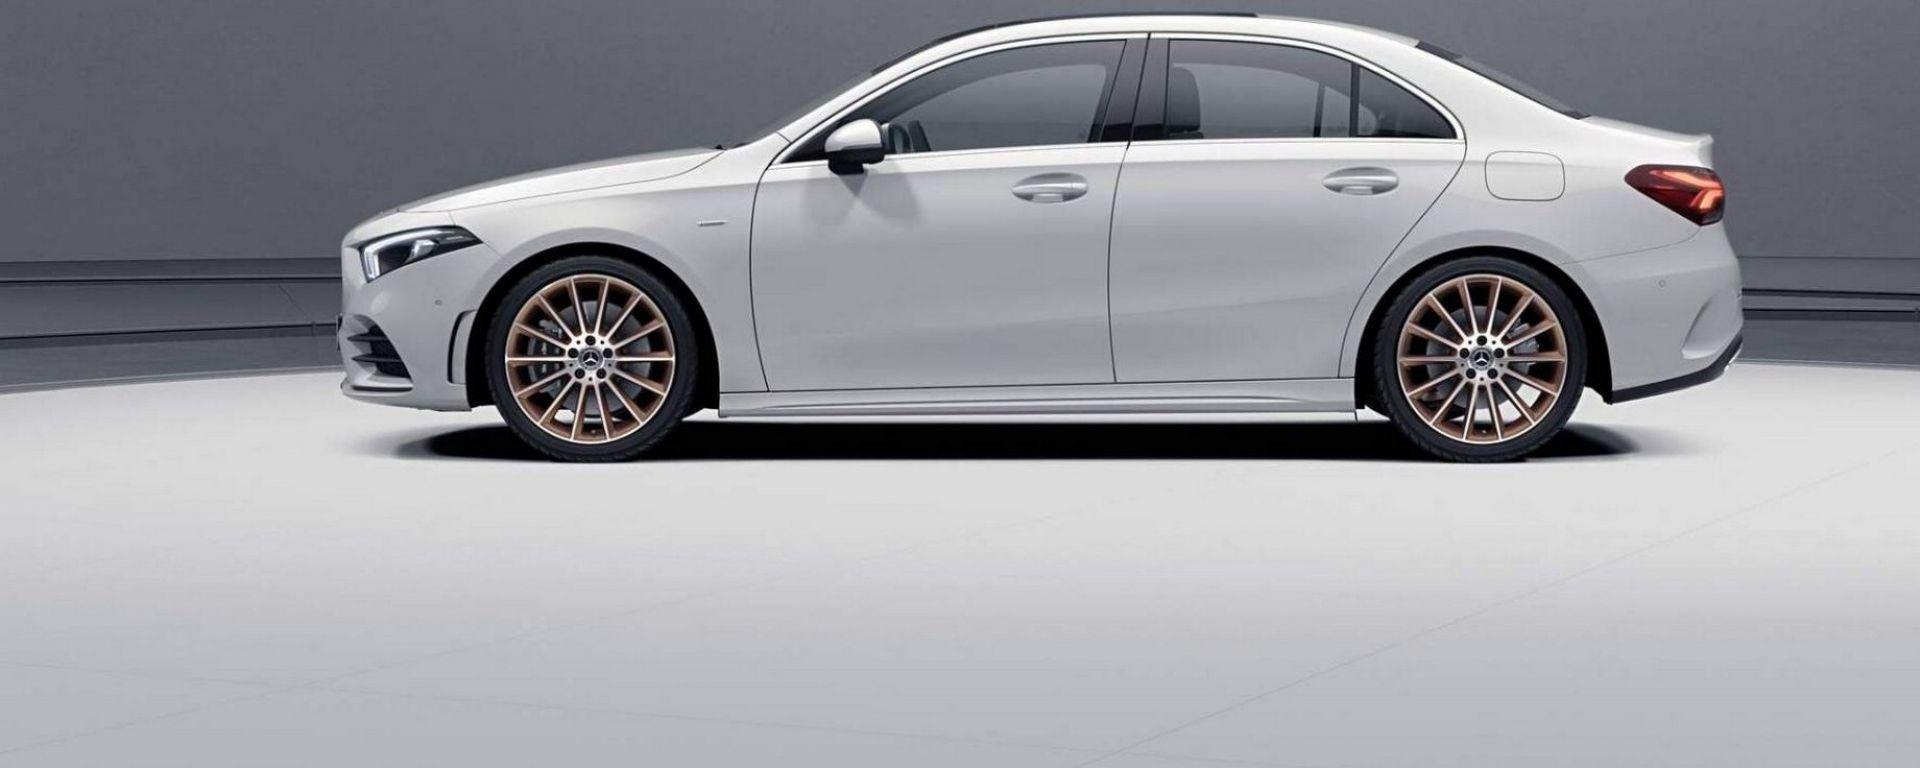 Mercedes Classe A berlina, ecco la Edition 1